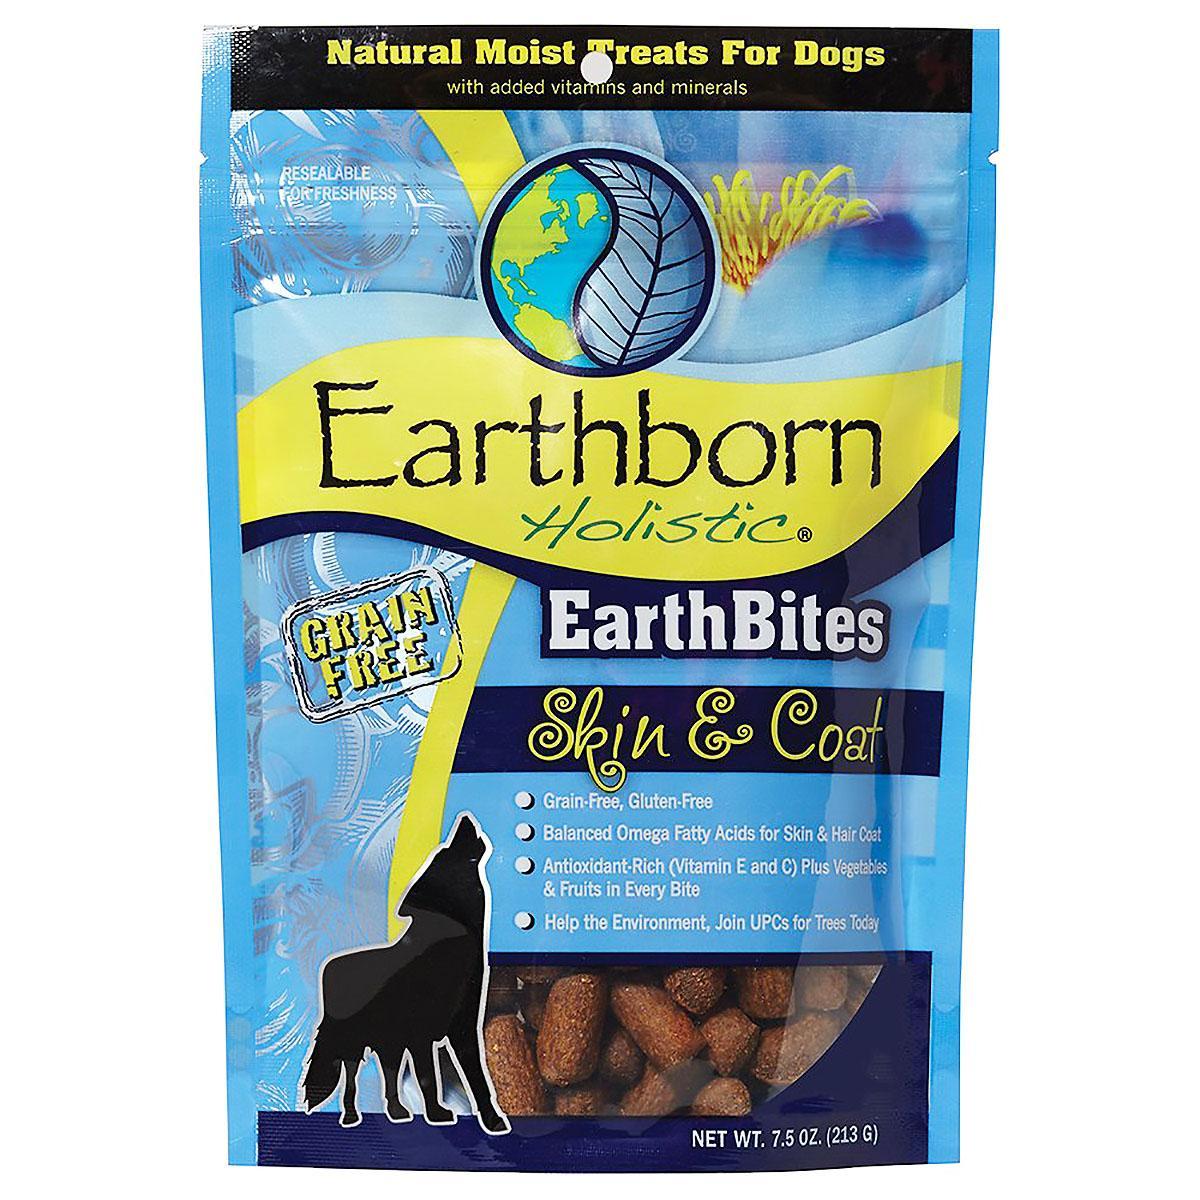 Earthborn Holistic Grain-Free EarthBites Moist Dog Treats - Skin & Coat Formula